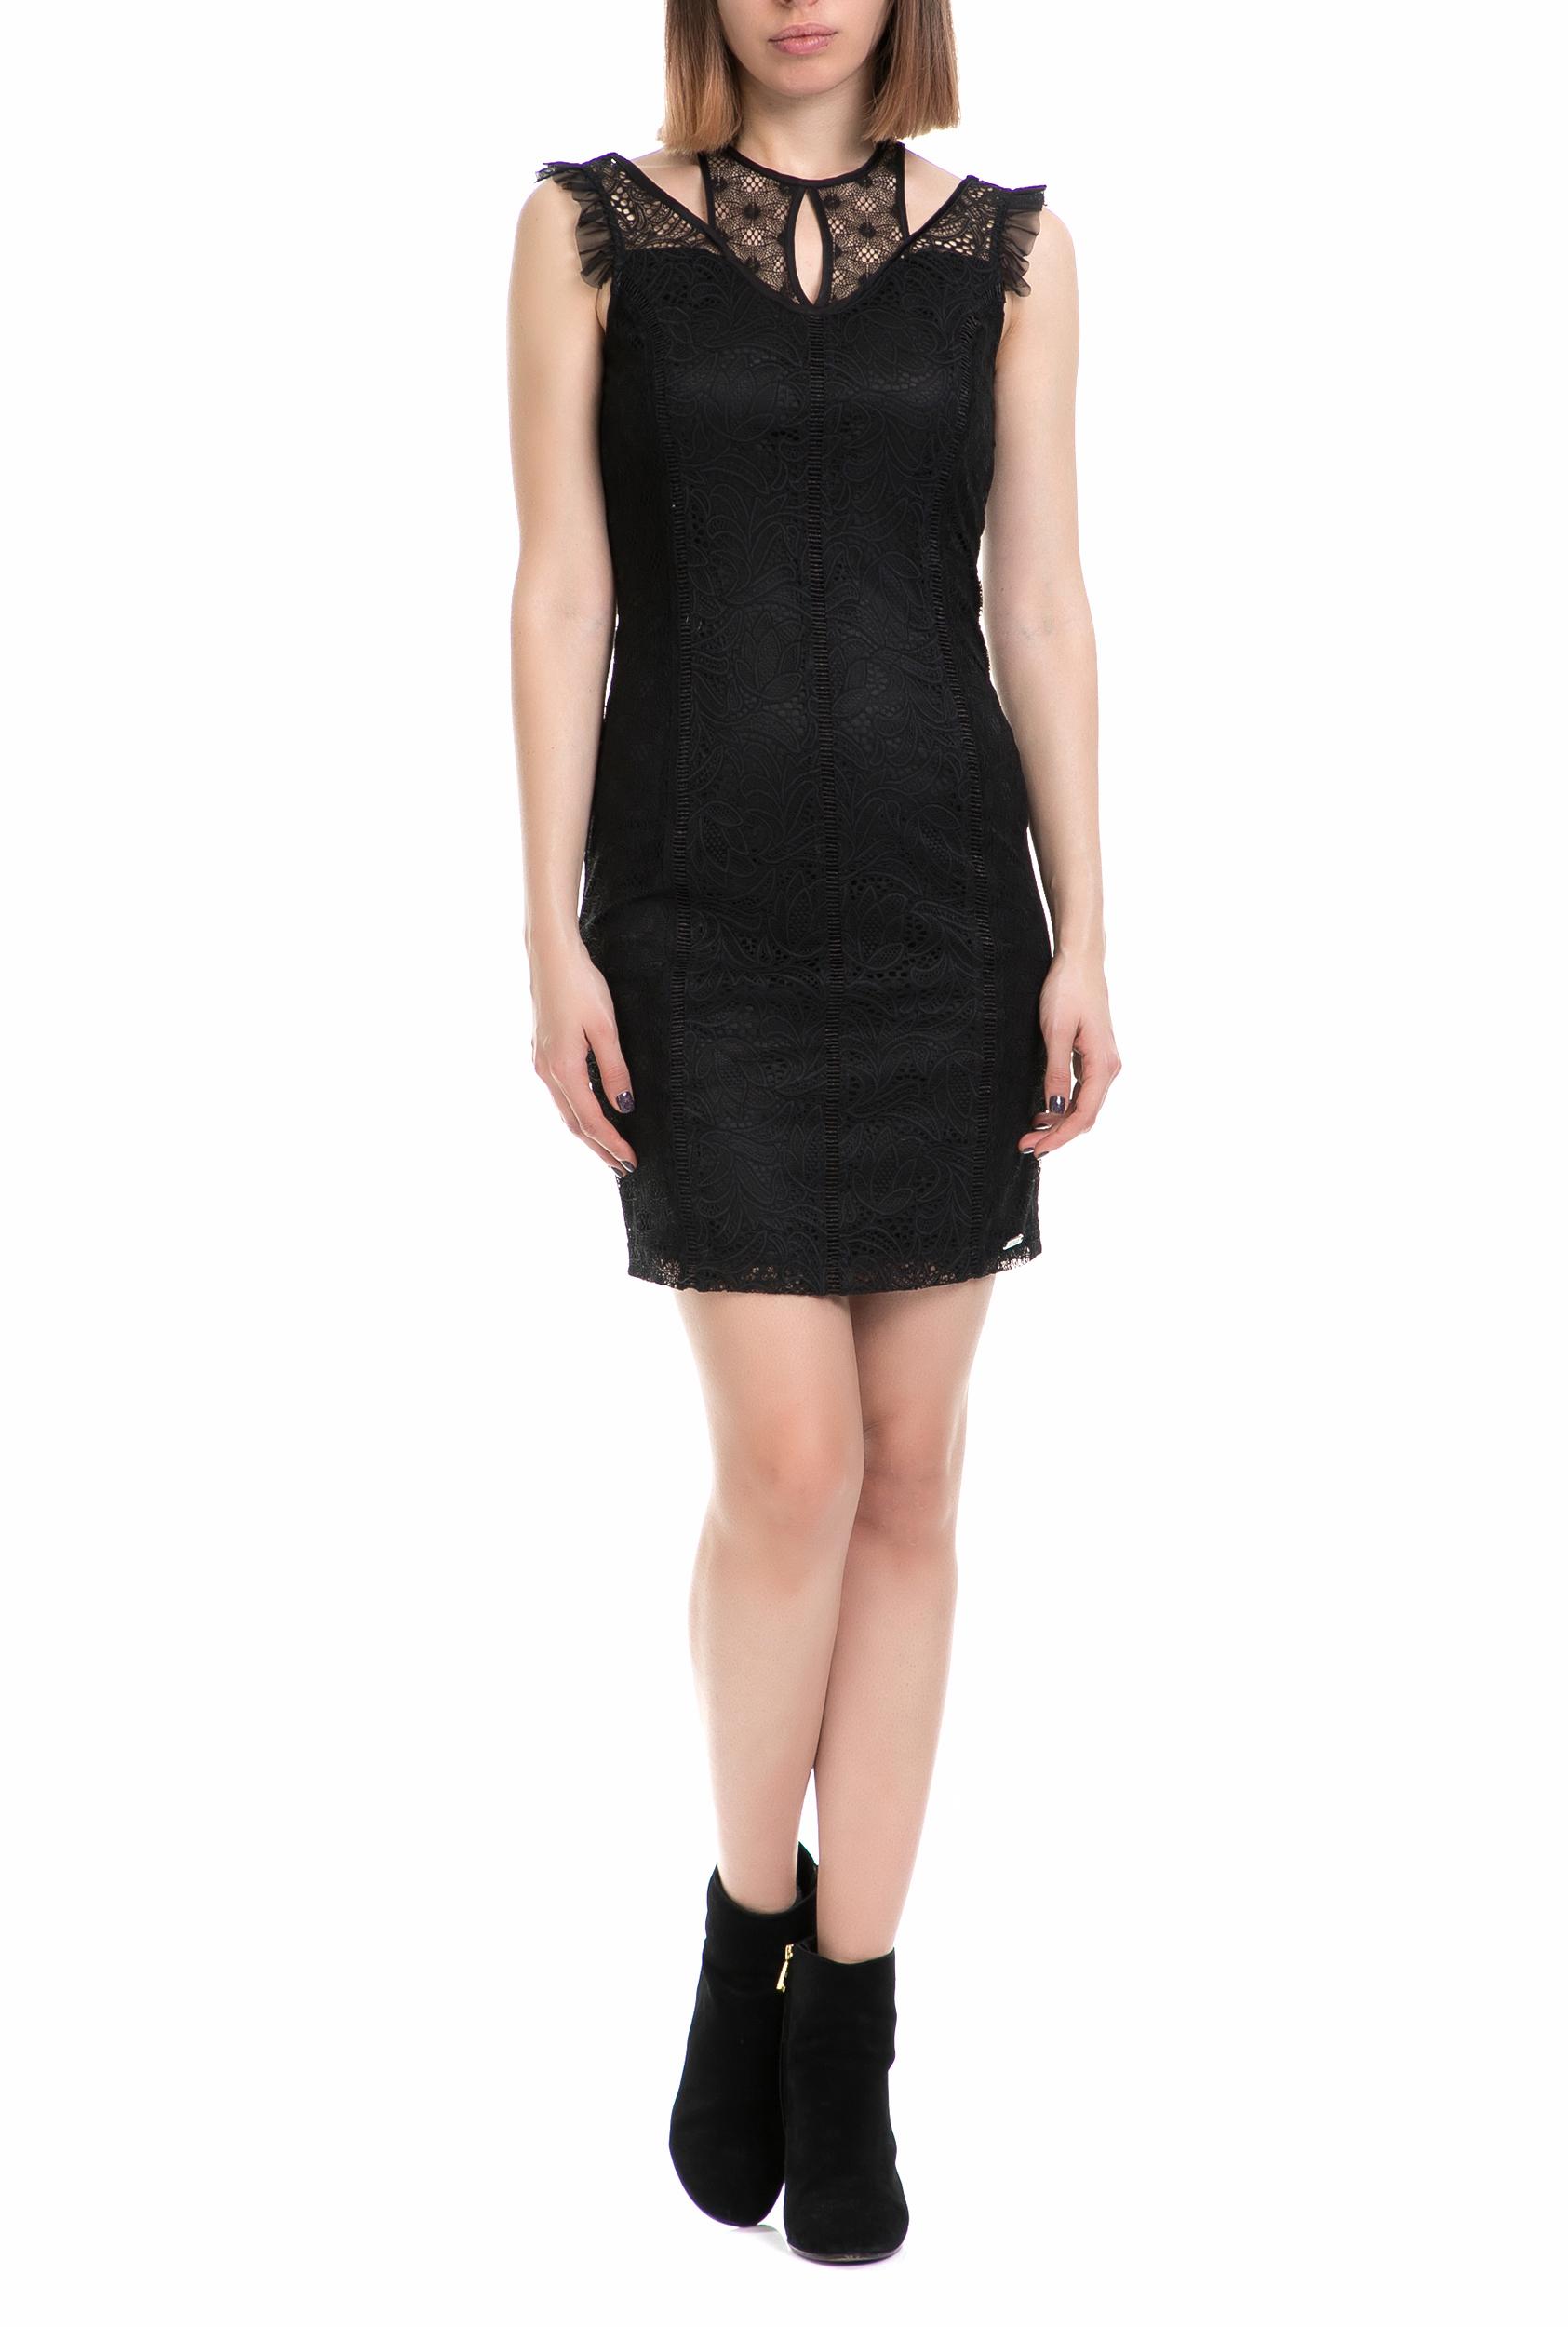 GUESS - Γυναικεία Φορέματα  9ad20455a04